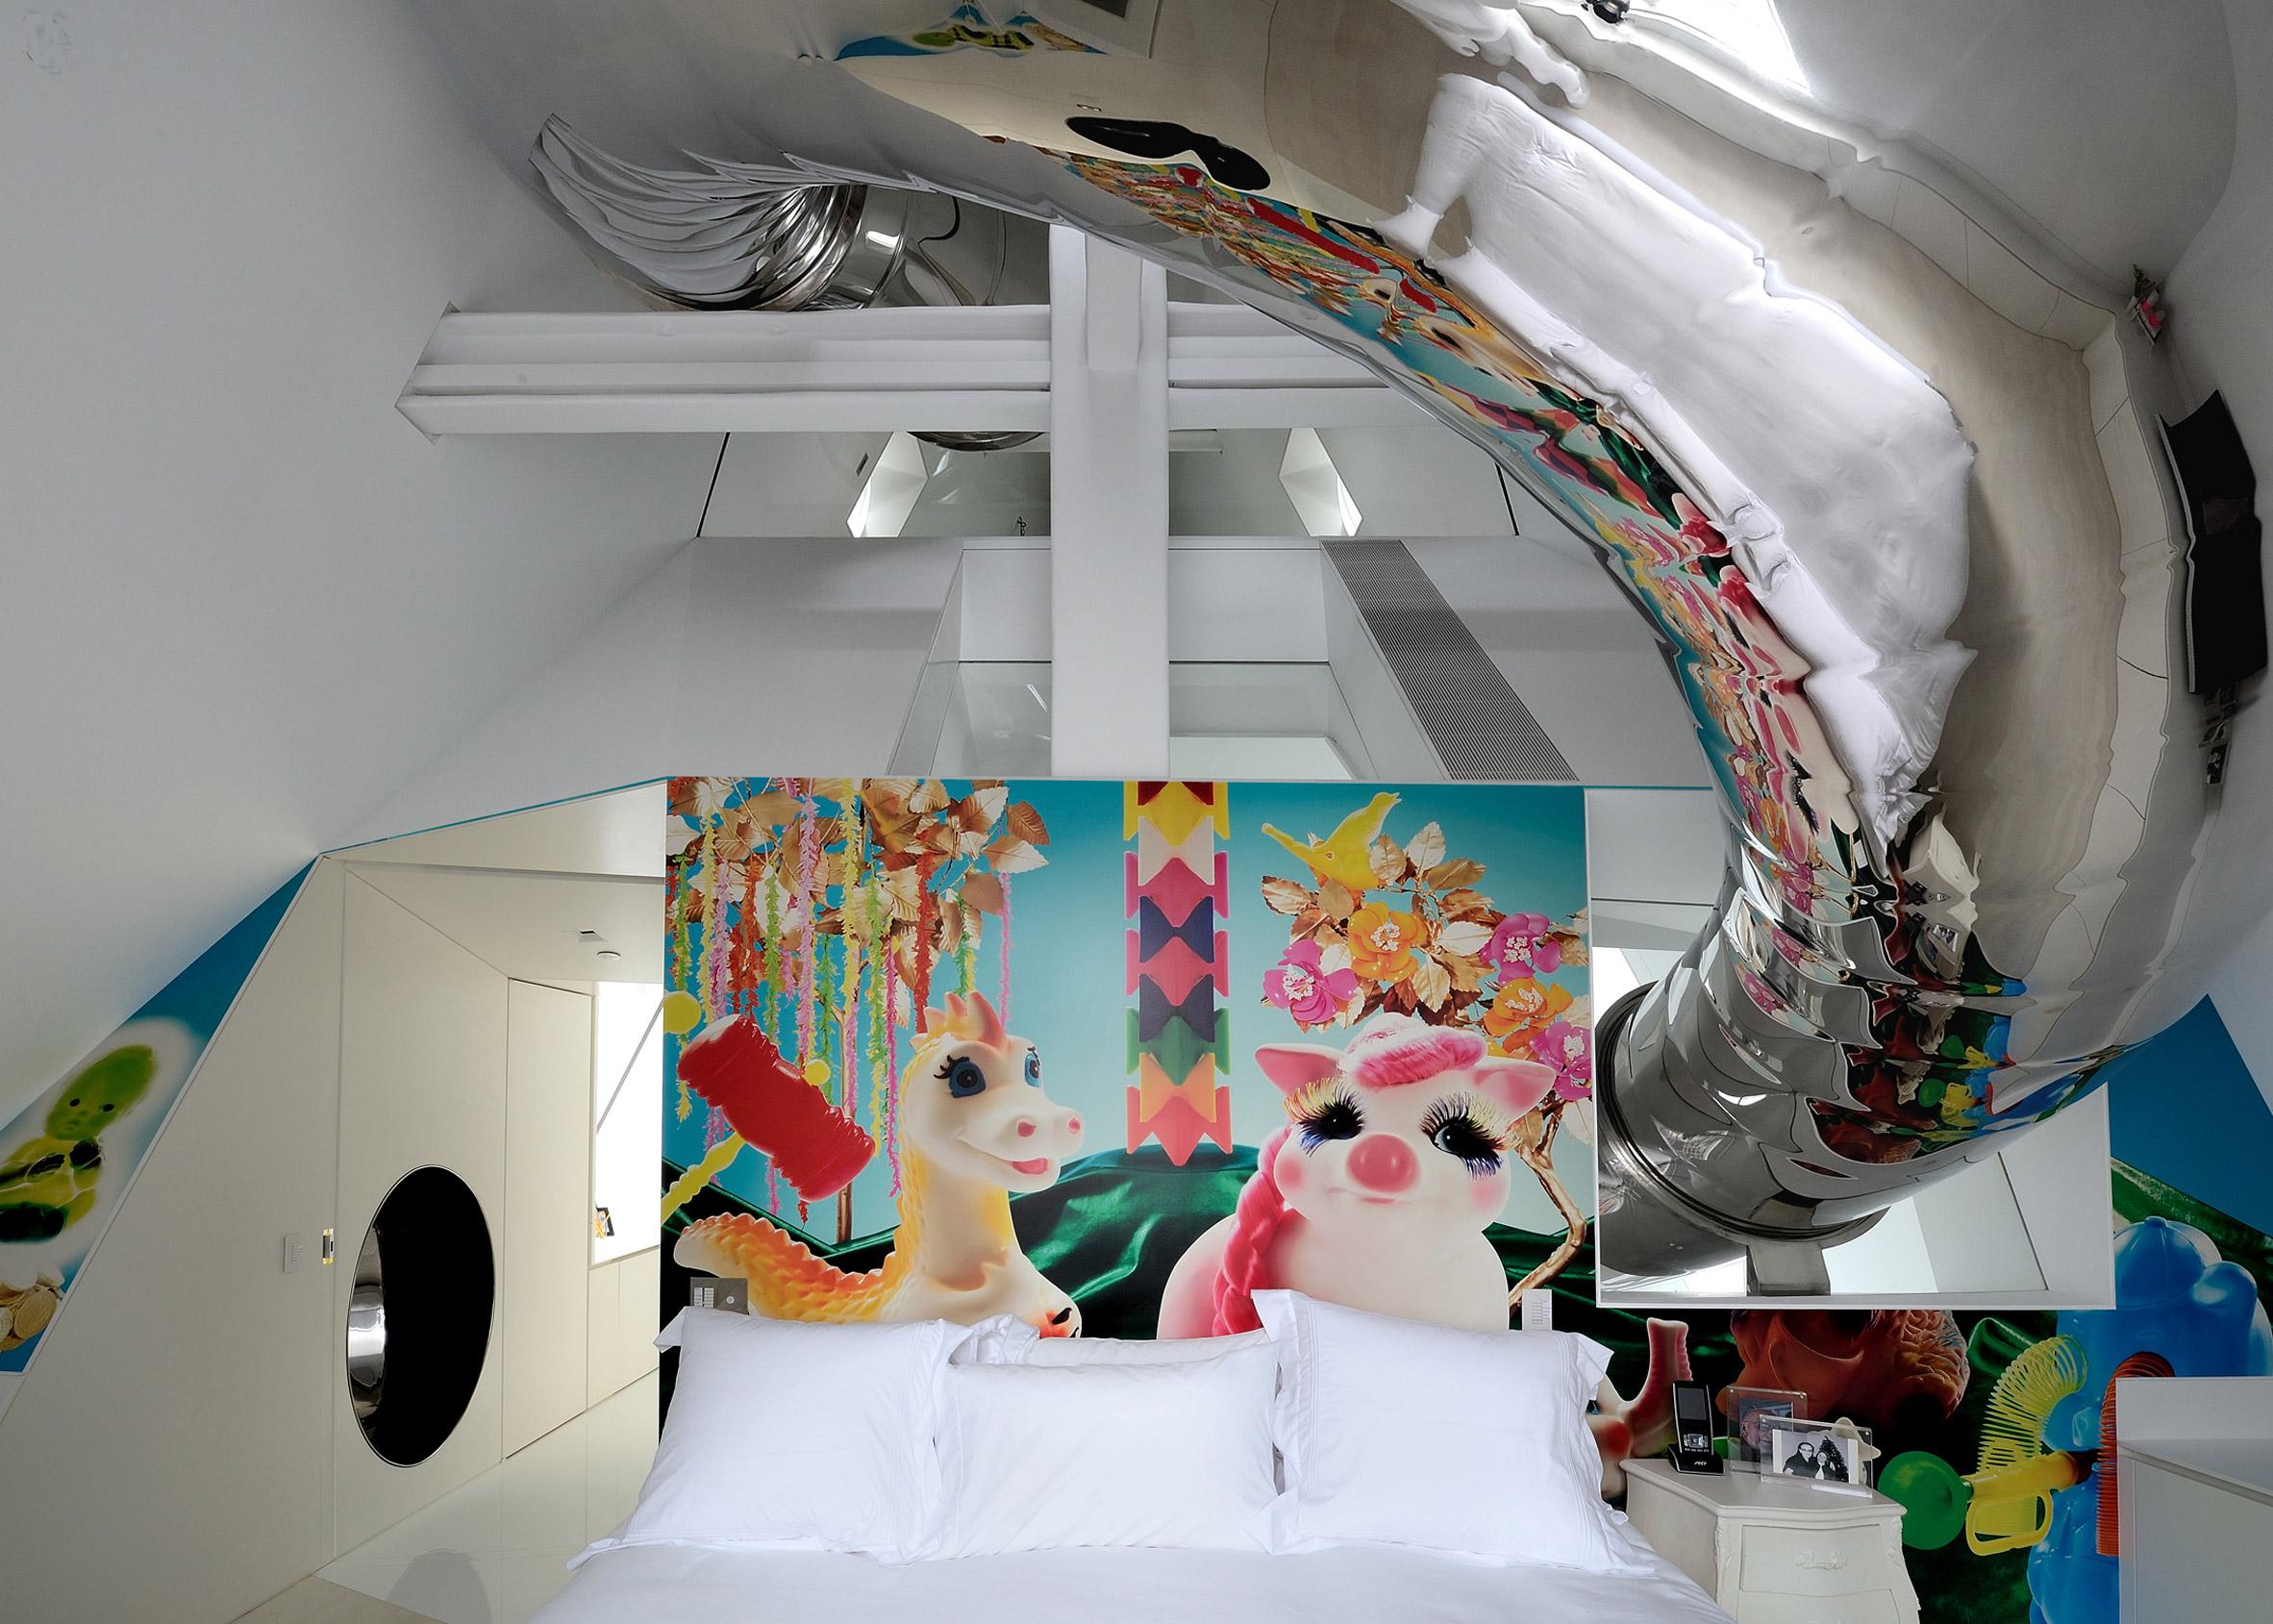 Skyhouse, USA, by David Hotson and Ghislaine Vinas